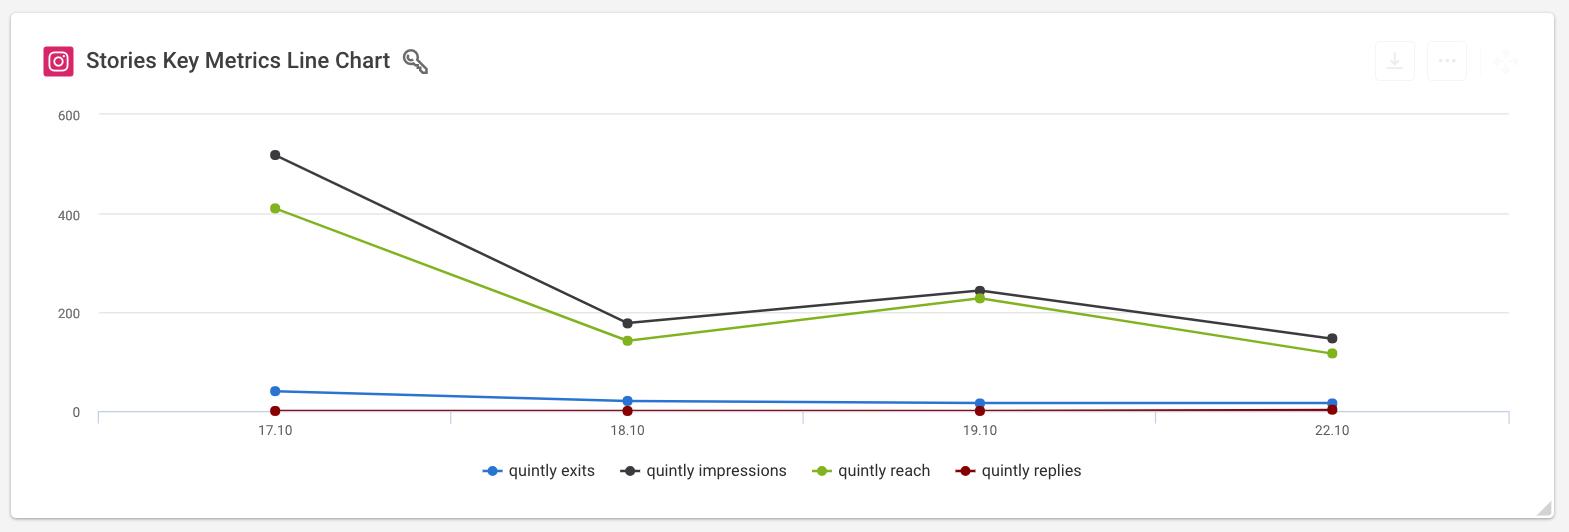 Instagram Stories Key Metrics Line Chart